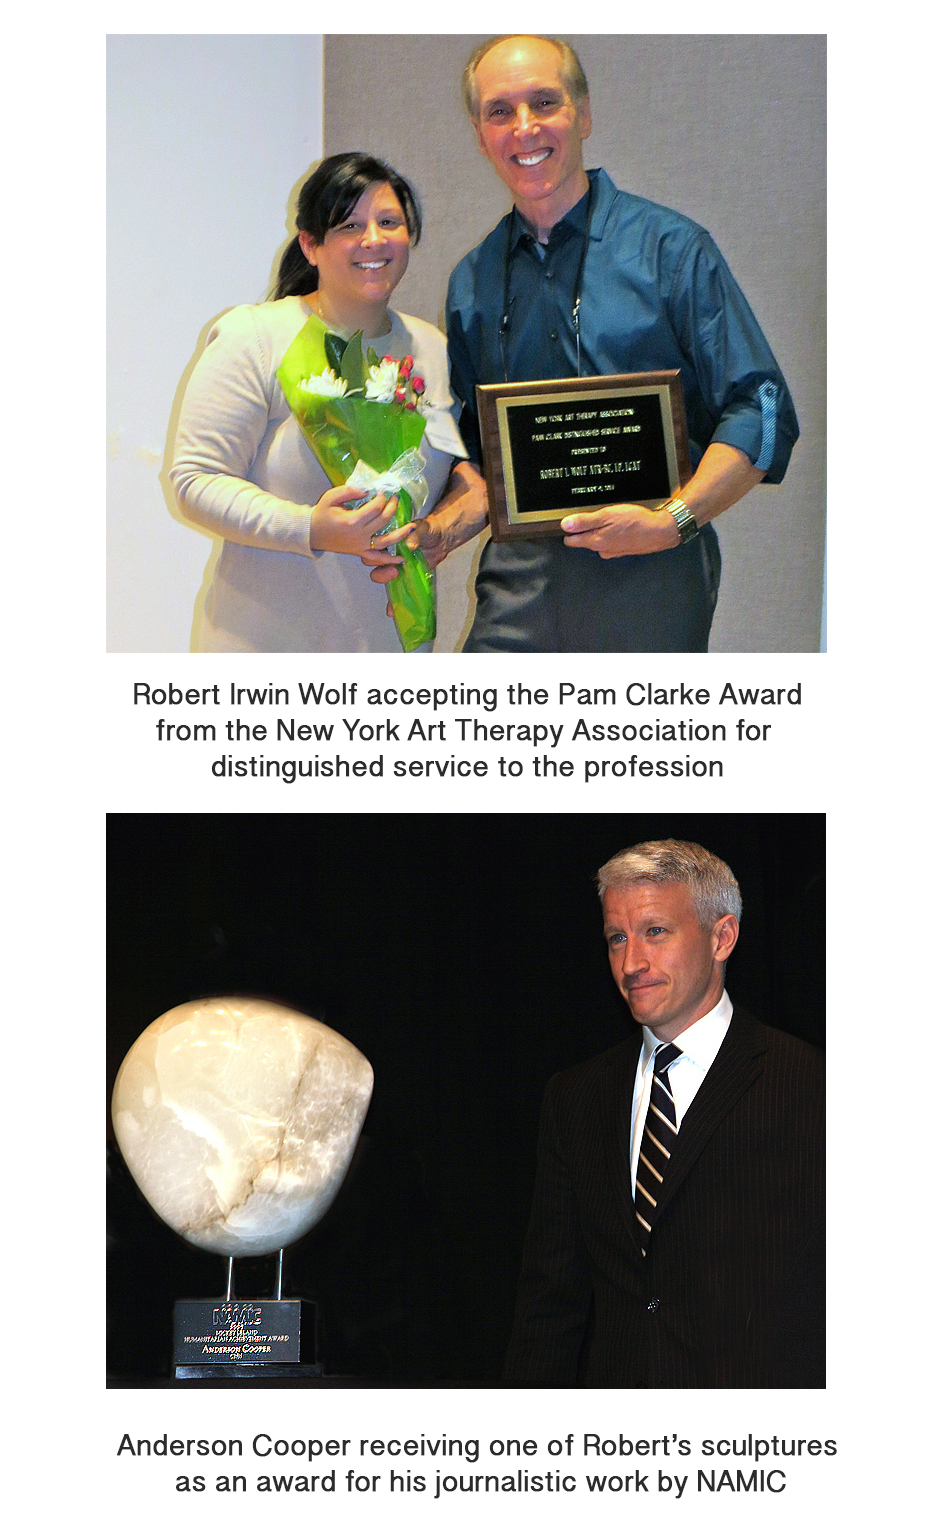 Robert Irwin Wolf, Art Therapy Professor